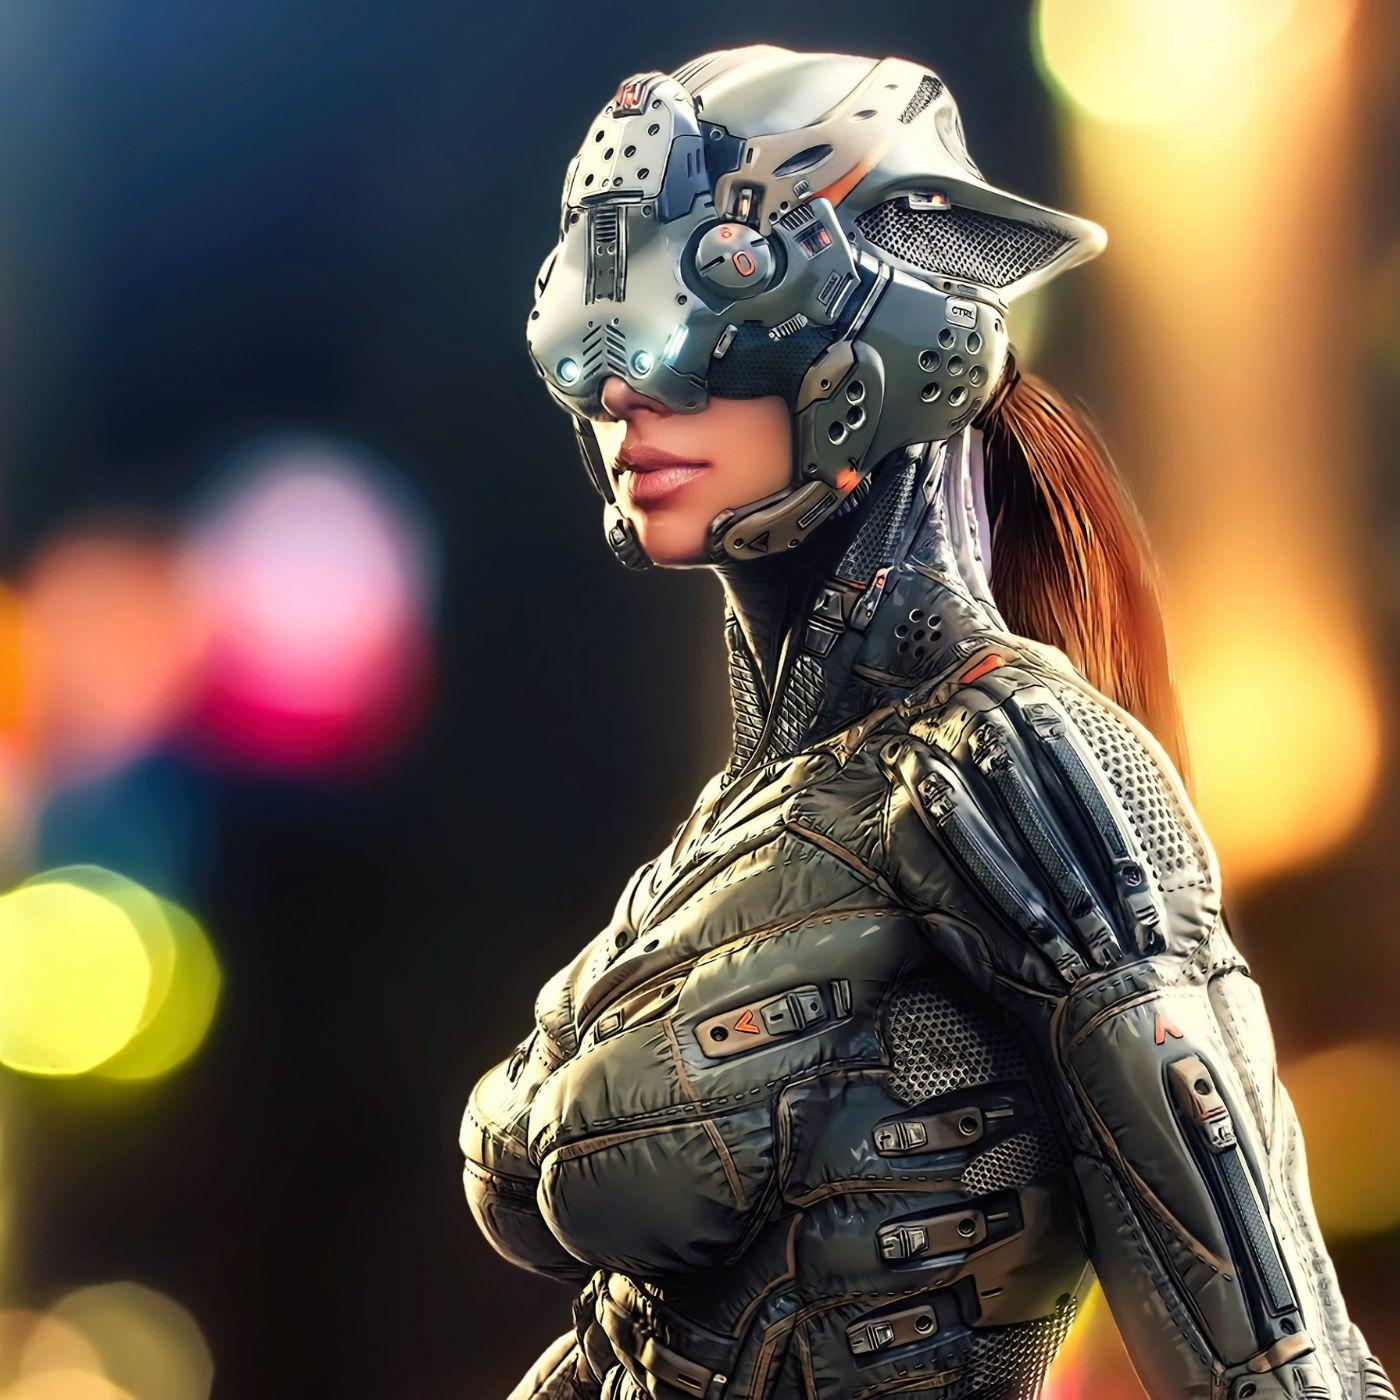 Fantasy Audio Drama (Aura) - Artificial Intelligence (AI) Written Story AudioBook - Chapter 1